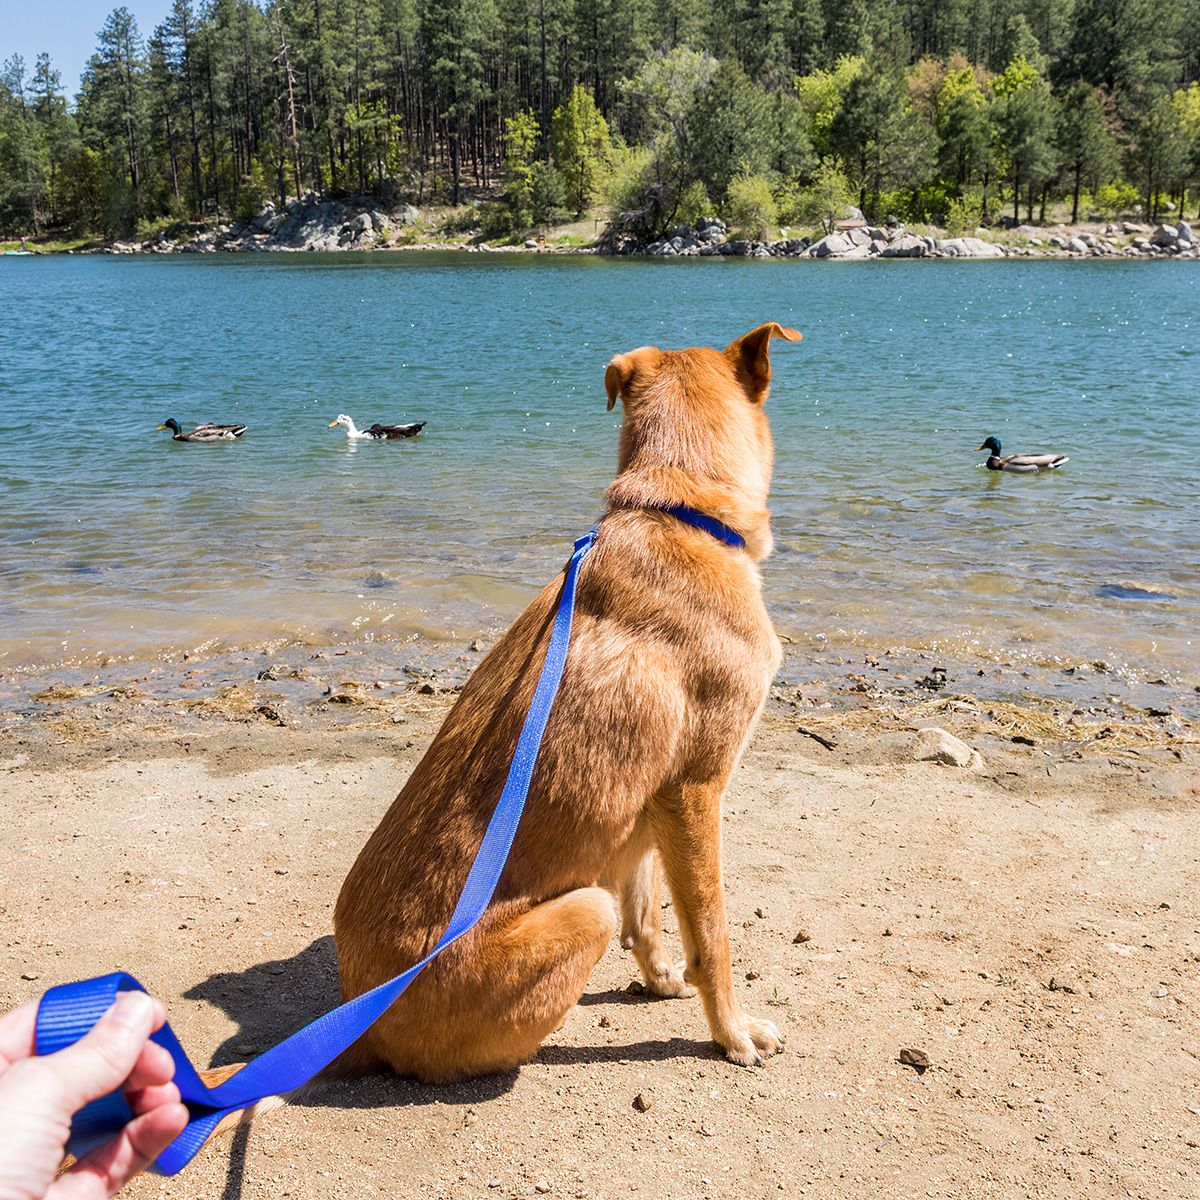 Dog Collars Harness Training Leash Petsmart Dog Collars Leashes Reflective Dog Harness Dogs